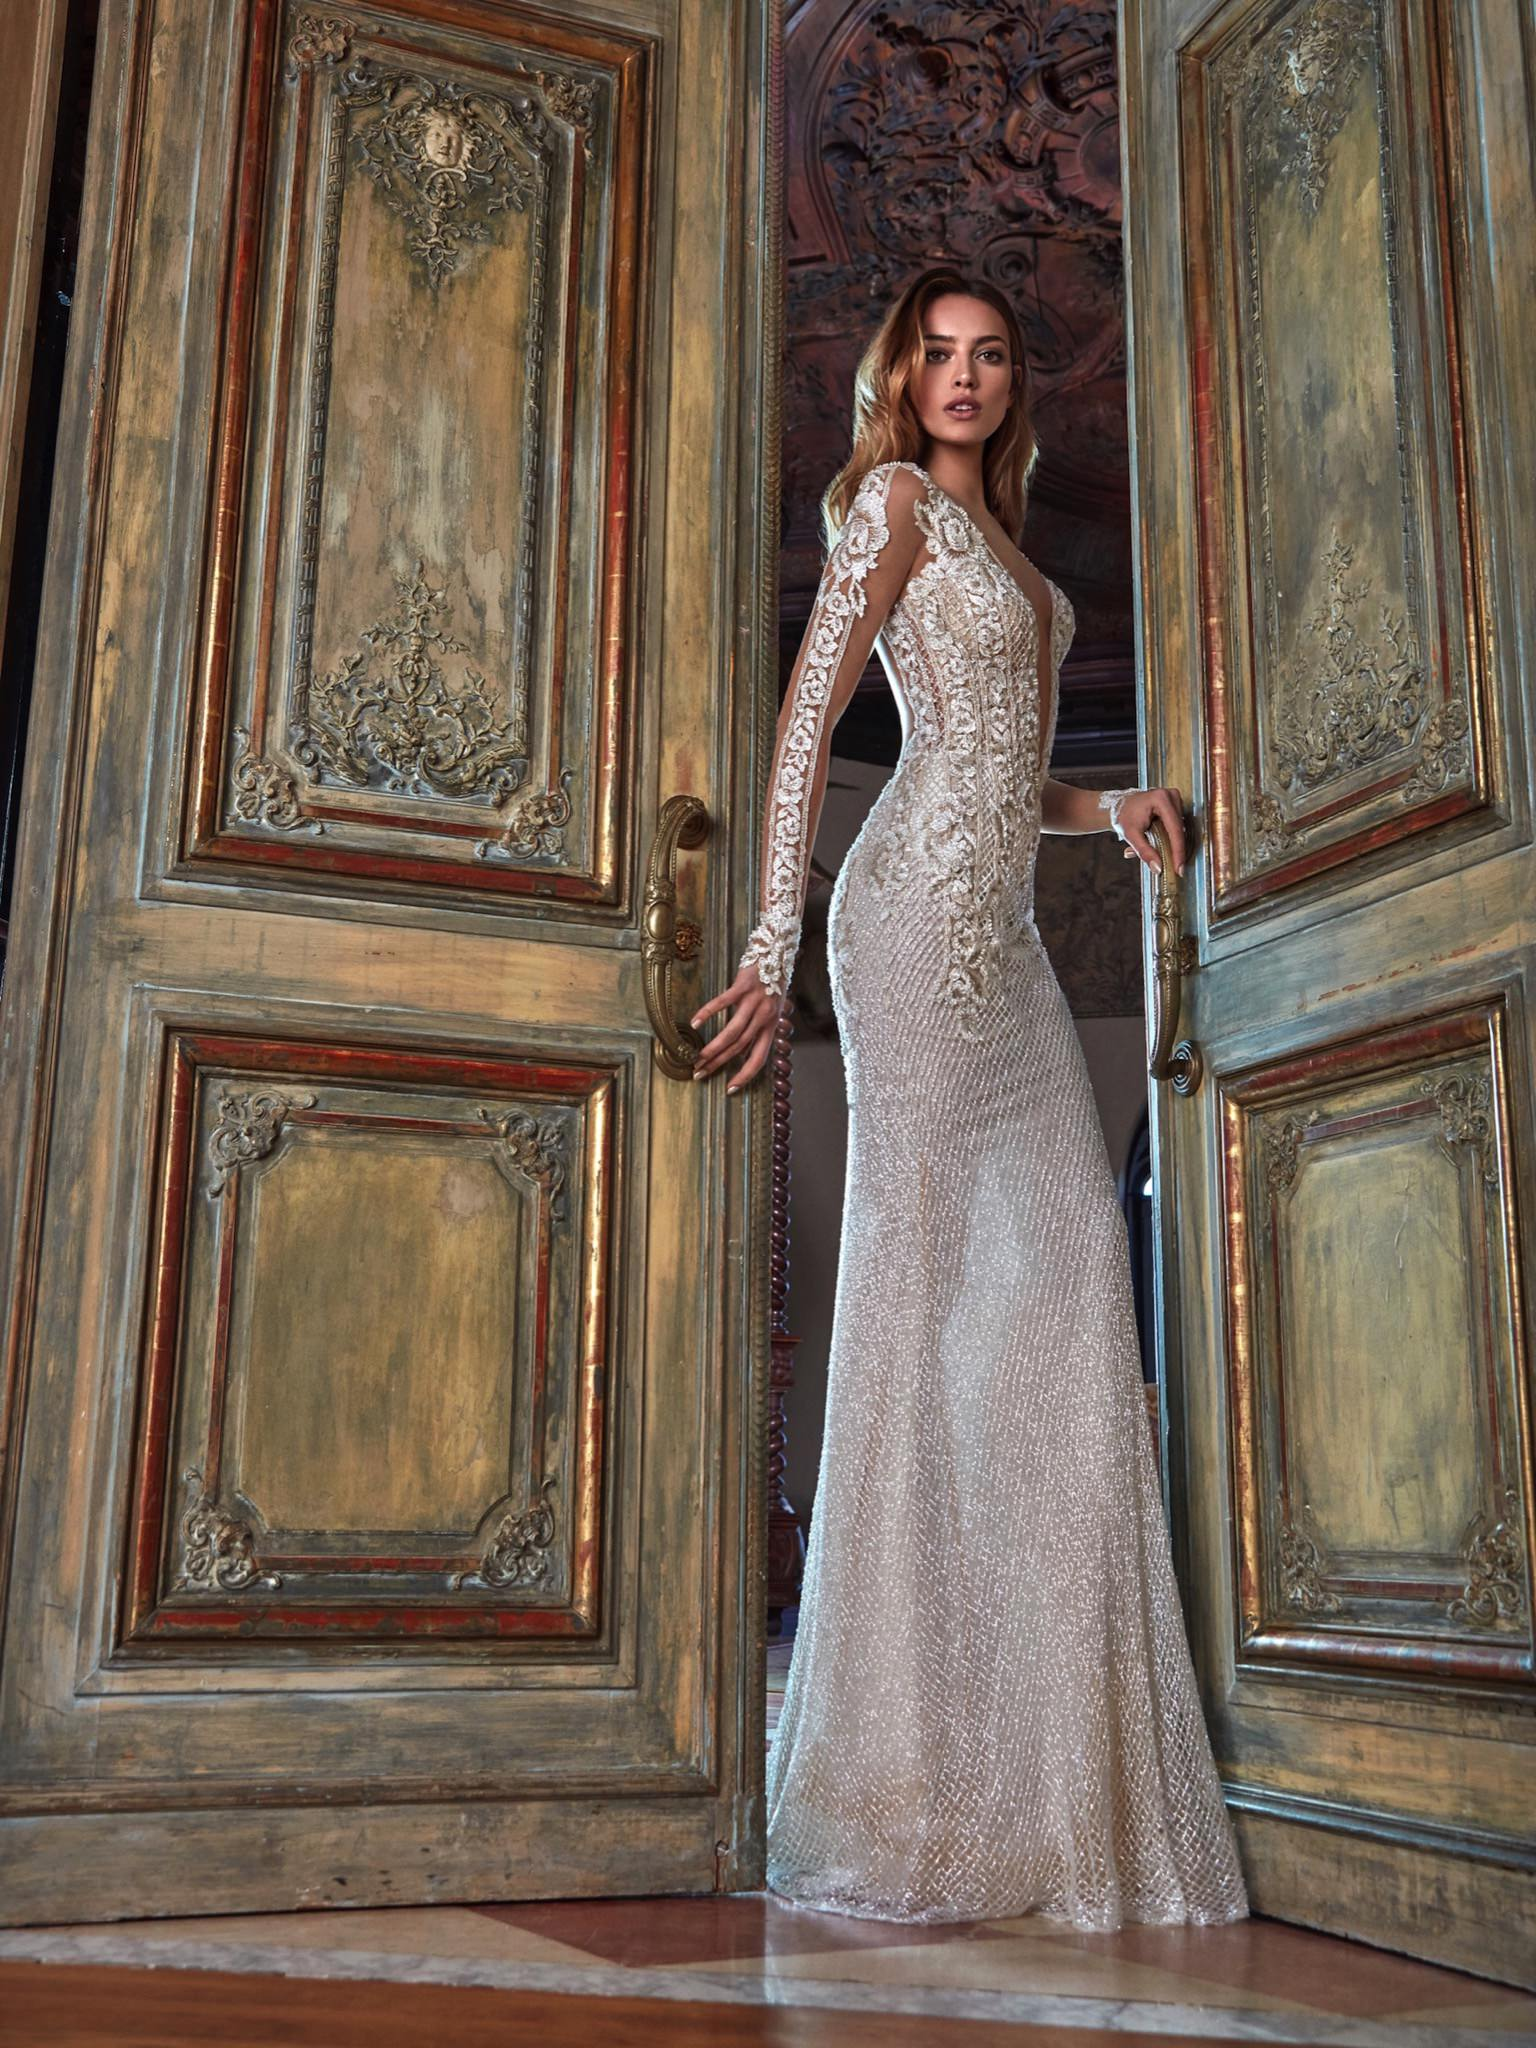 Galia lahav bella wedding dress browns bride galia lahav bella wedding dress galia lahav junglespirit Gallery